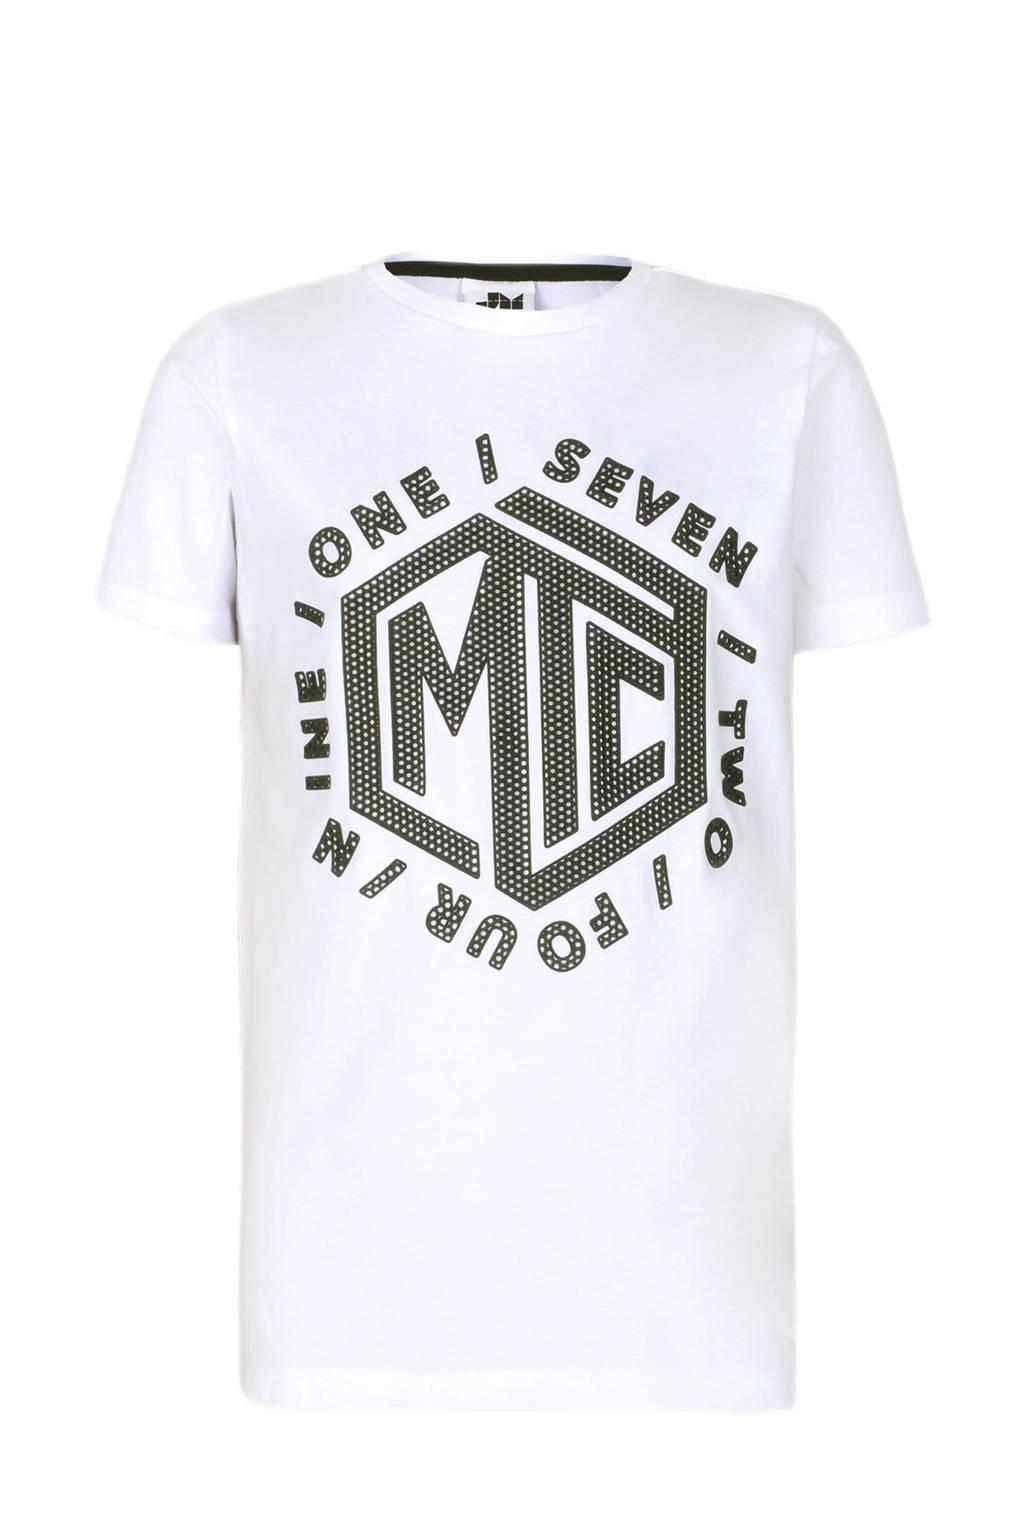 Jill & Mitch by Shoeby T-shirt Lex met printopdruk wit, Wit